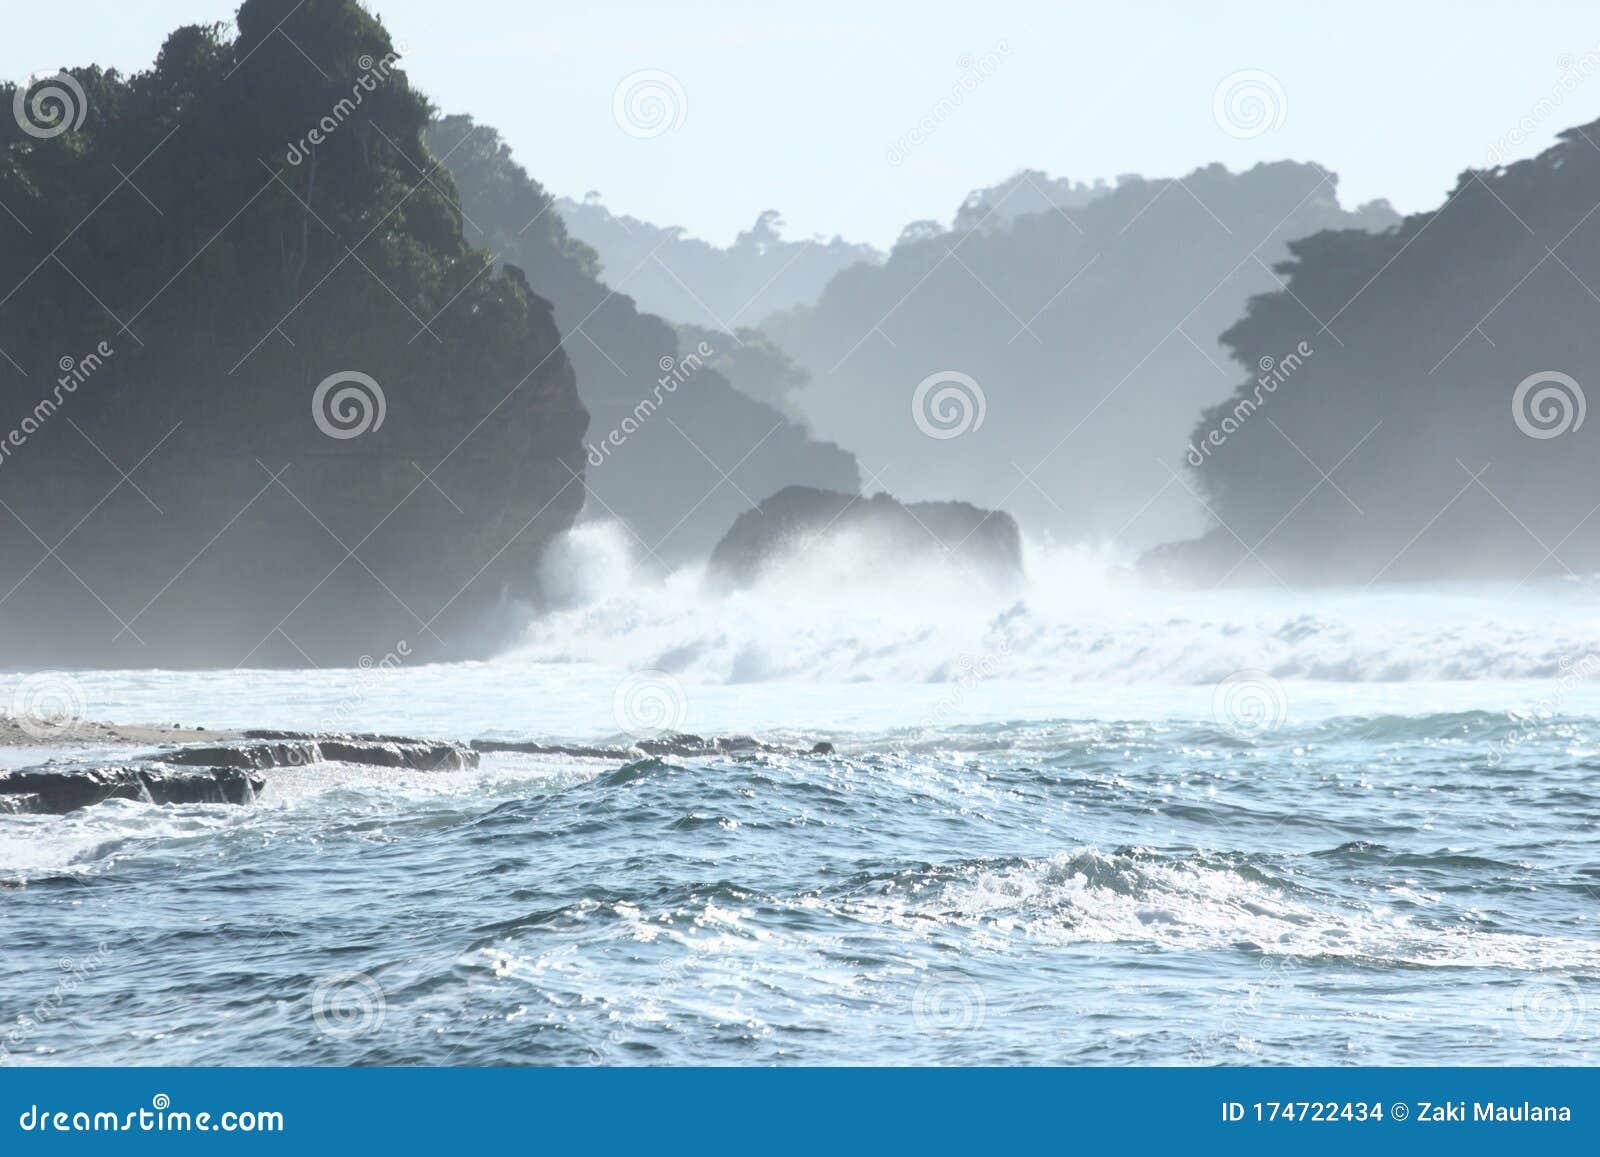 Beautifull Blue Wave At Goa Cina Stock Photo Image Of Beauty Cloud 174722434